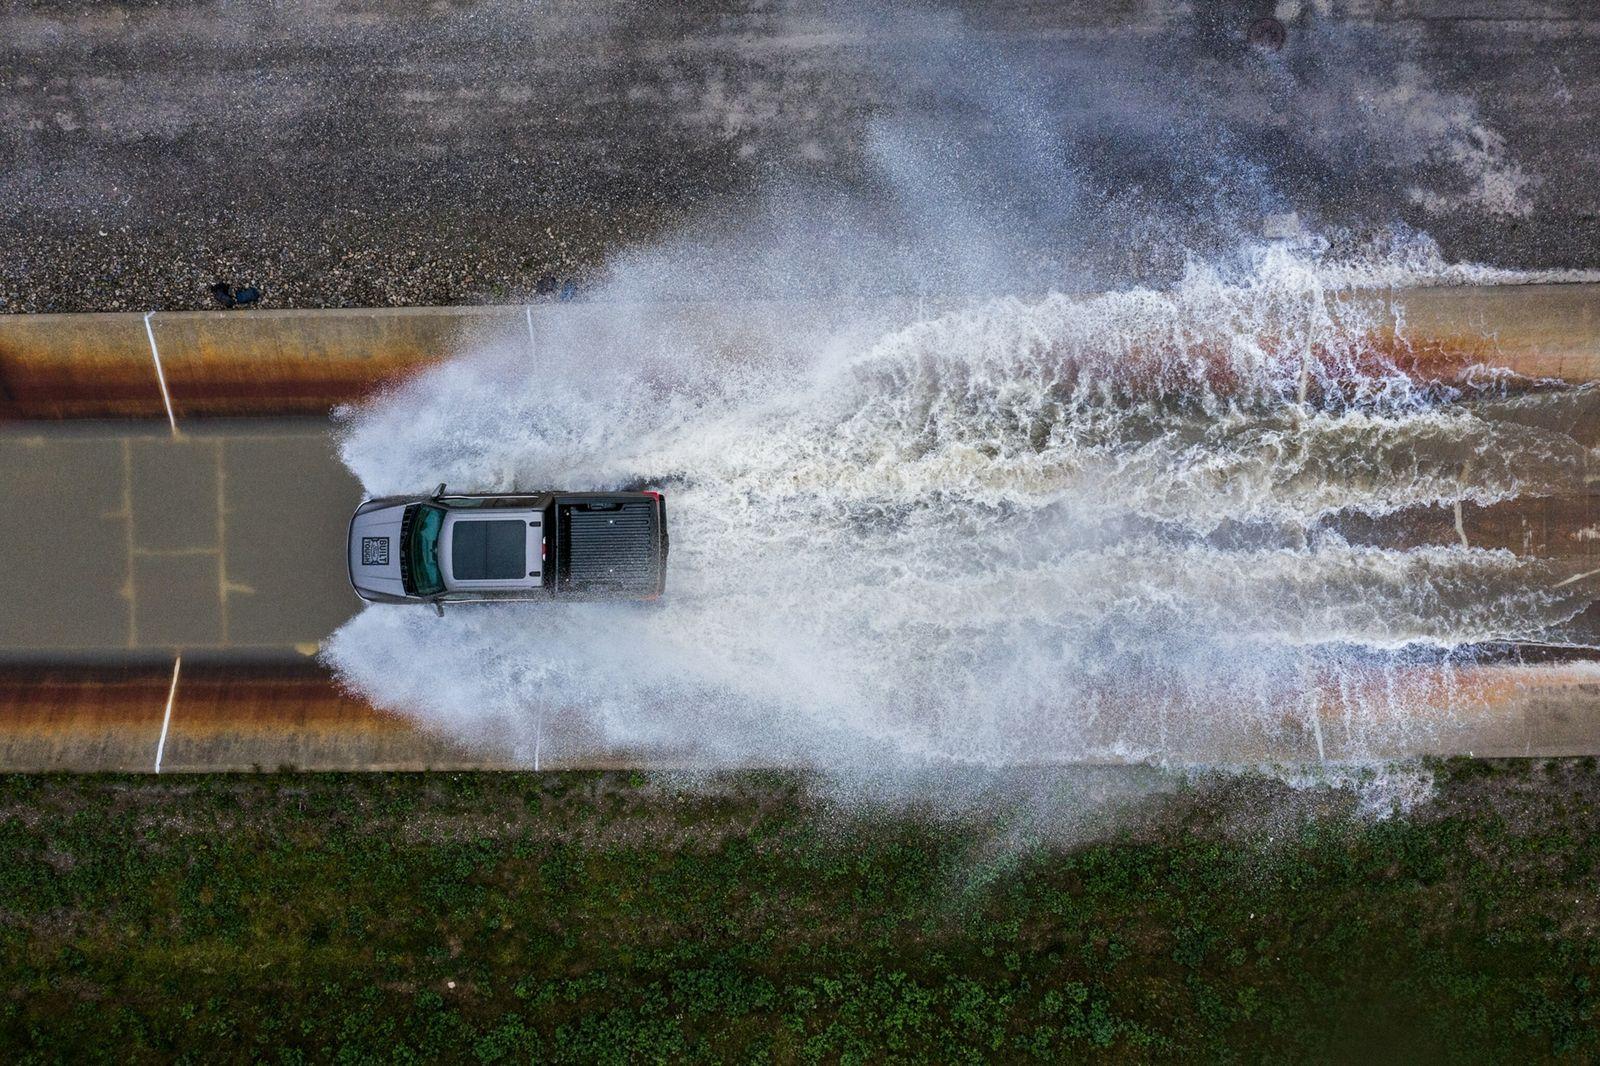 greening-cars-truck-water-crossing